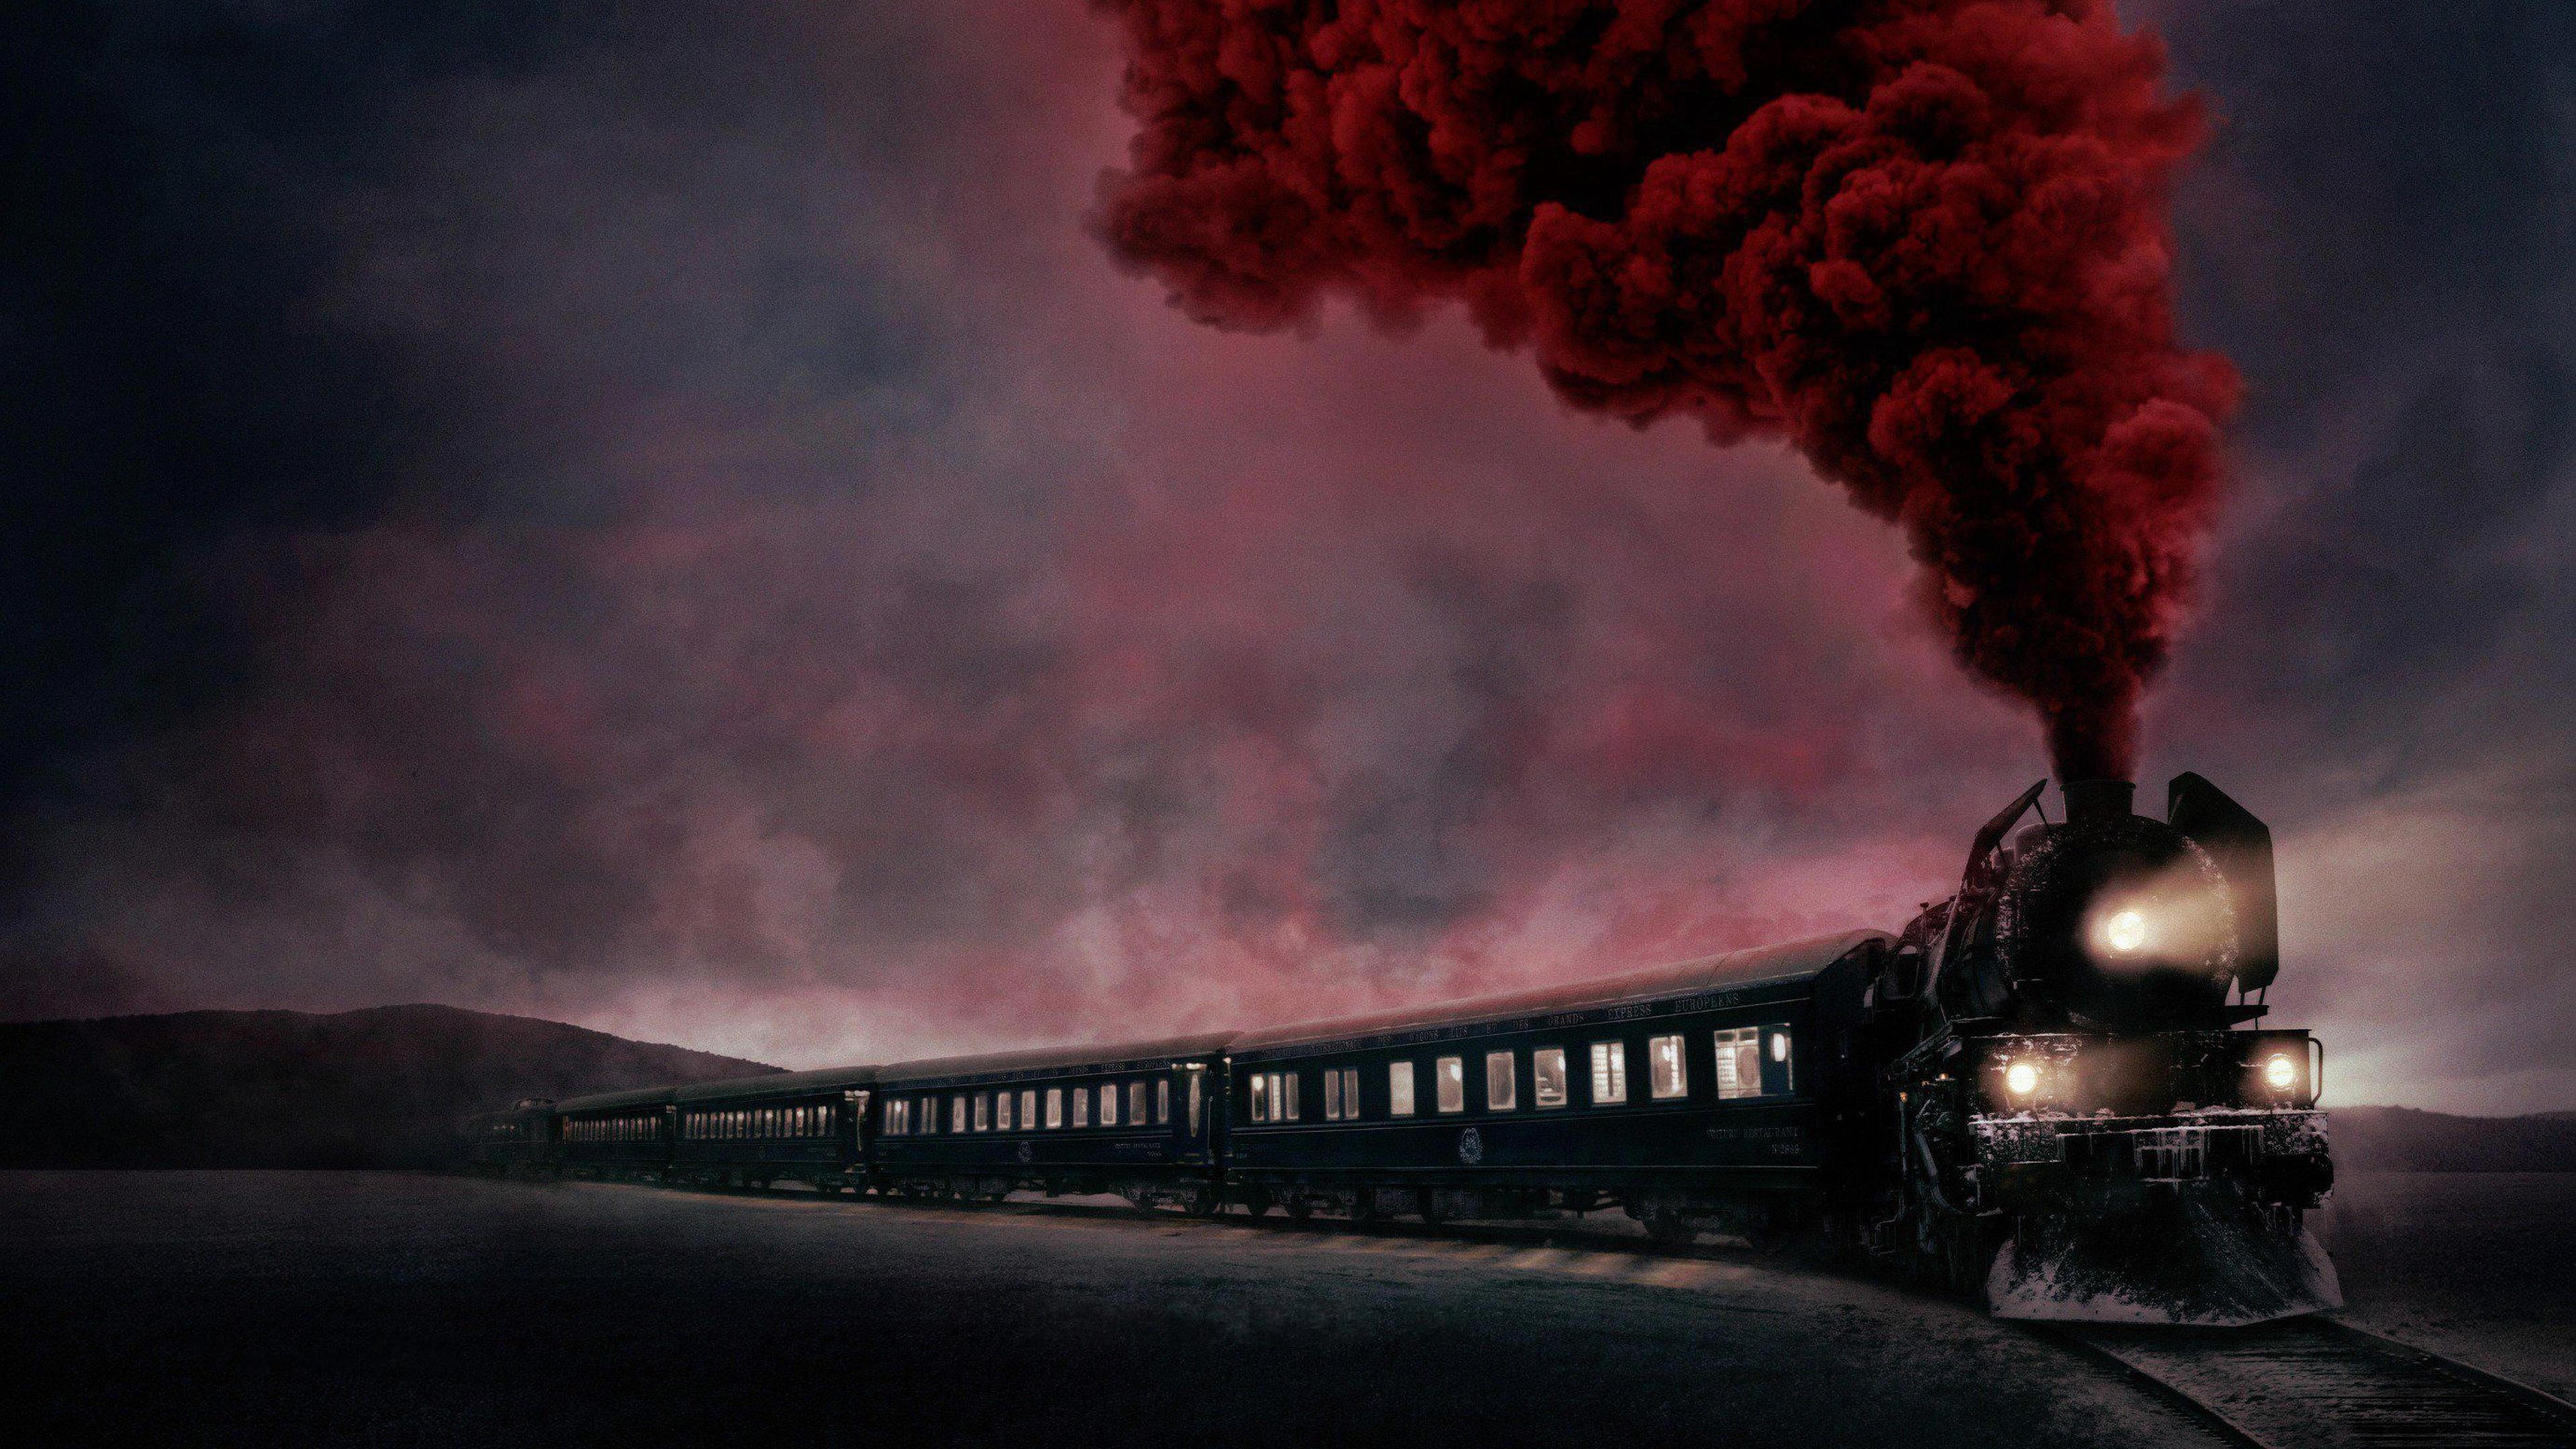 Wallpaper Murder On The Orient Express Train 4k Movies